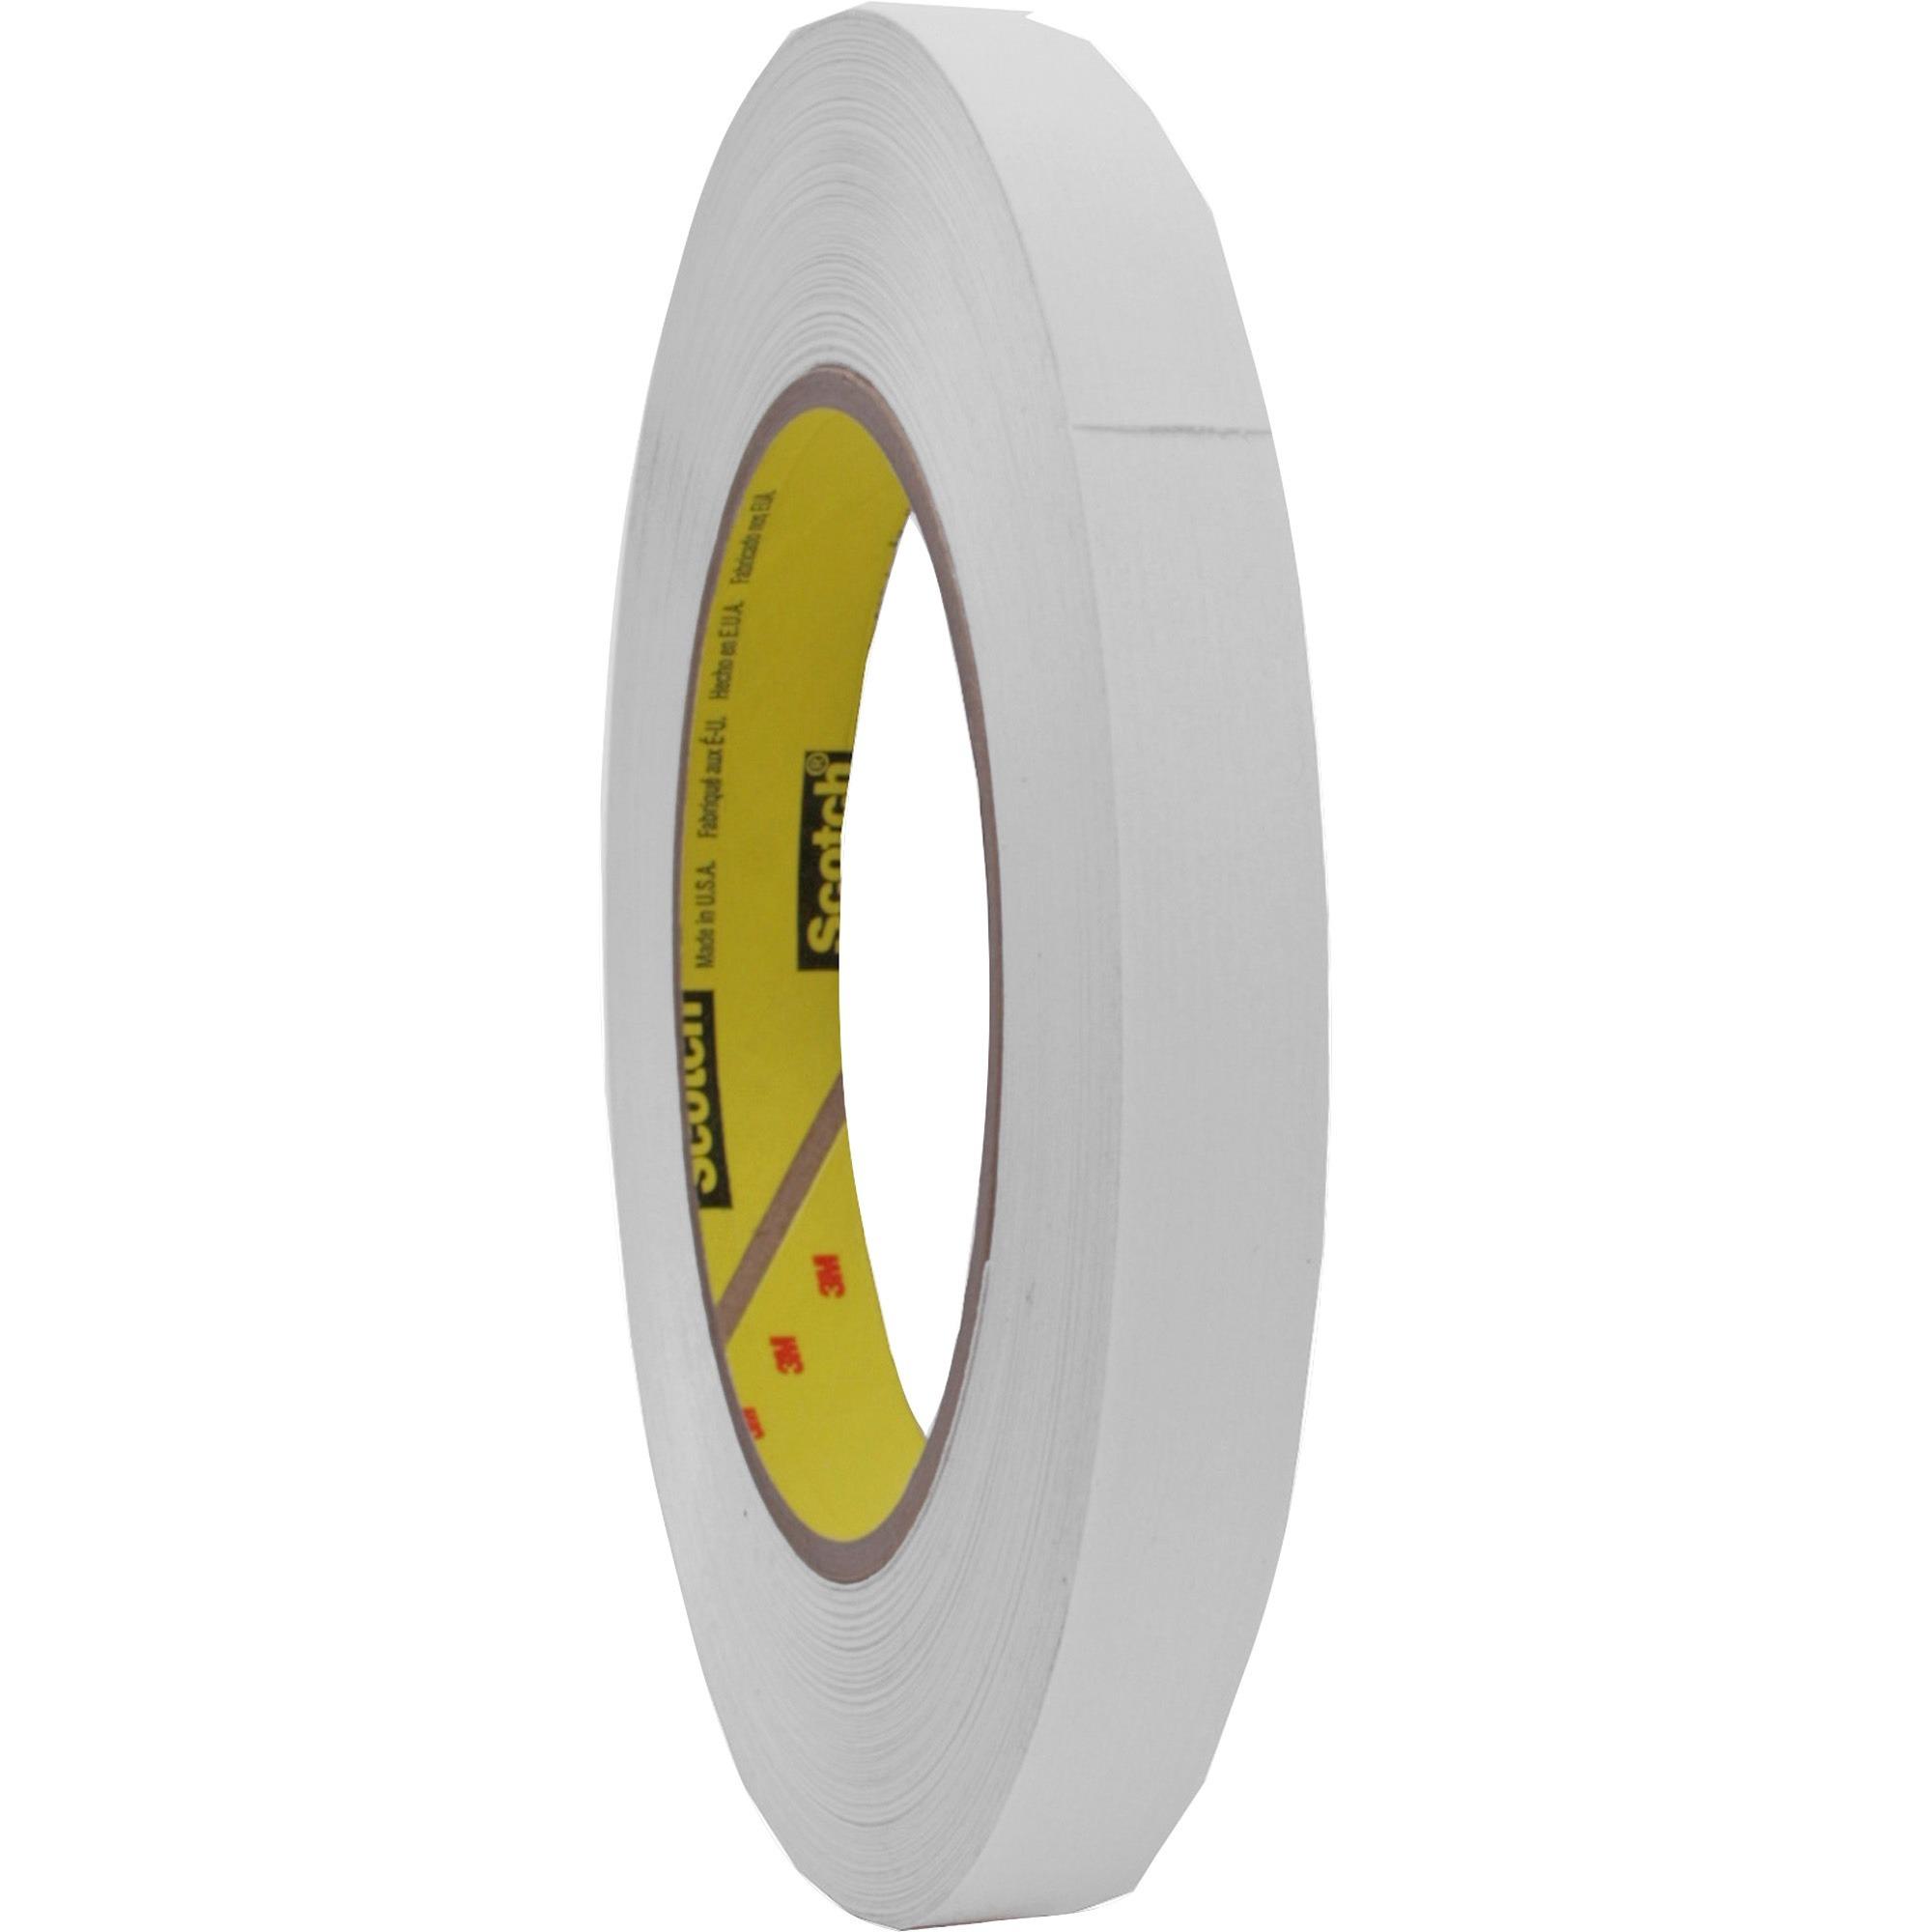 "256 Printable Flatback Paper Tape, 1/2"" x 60yds, 3"" Core, White"